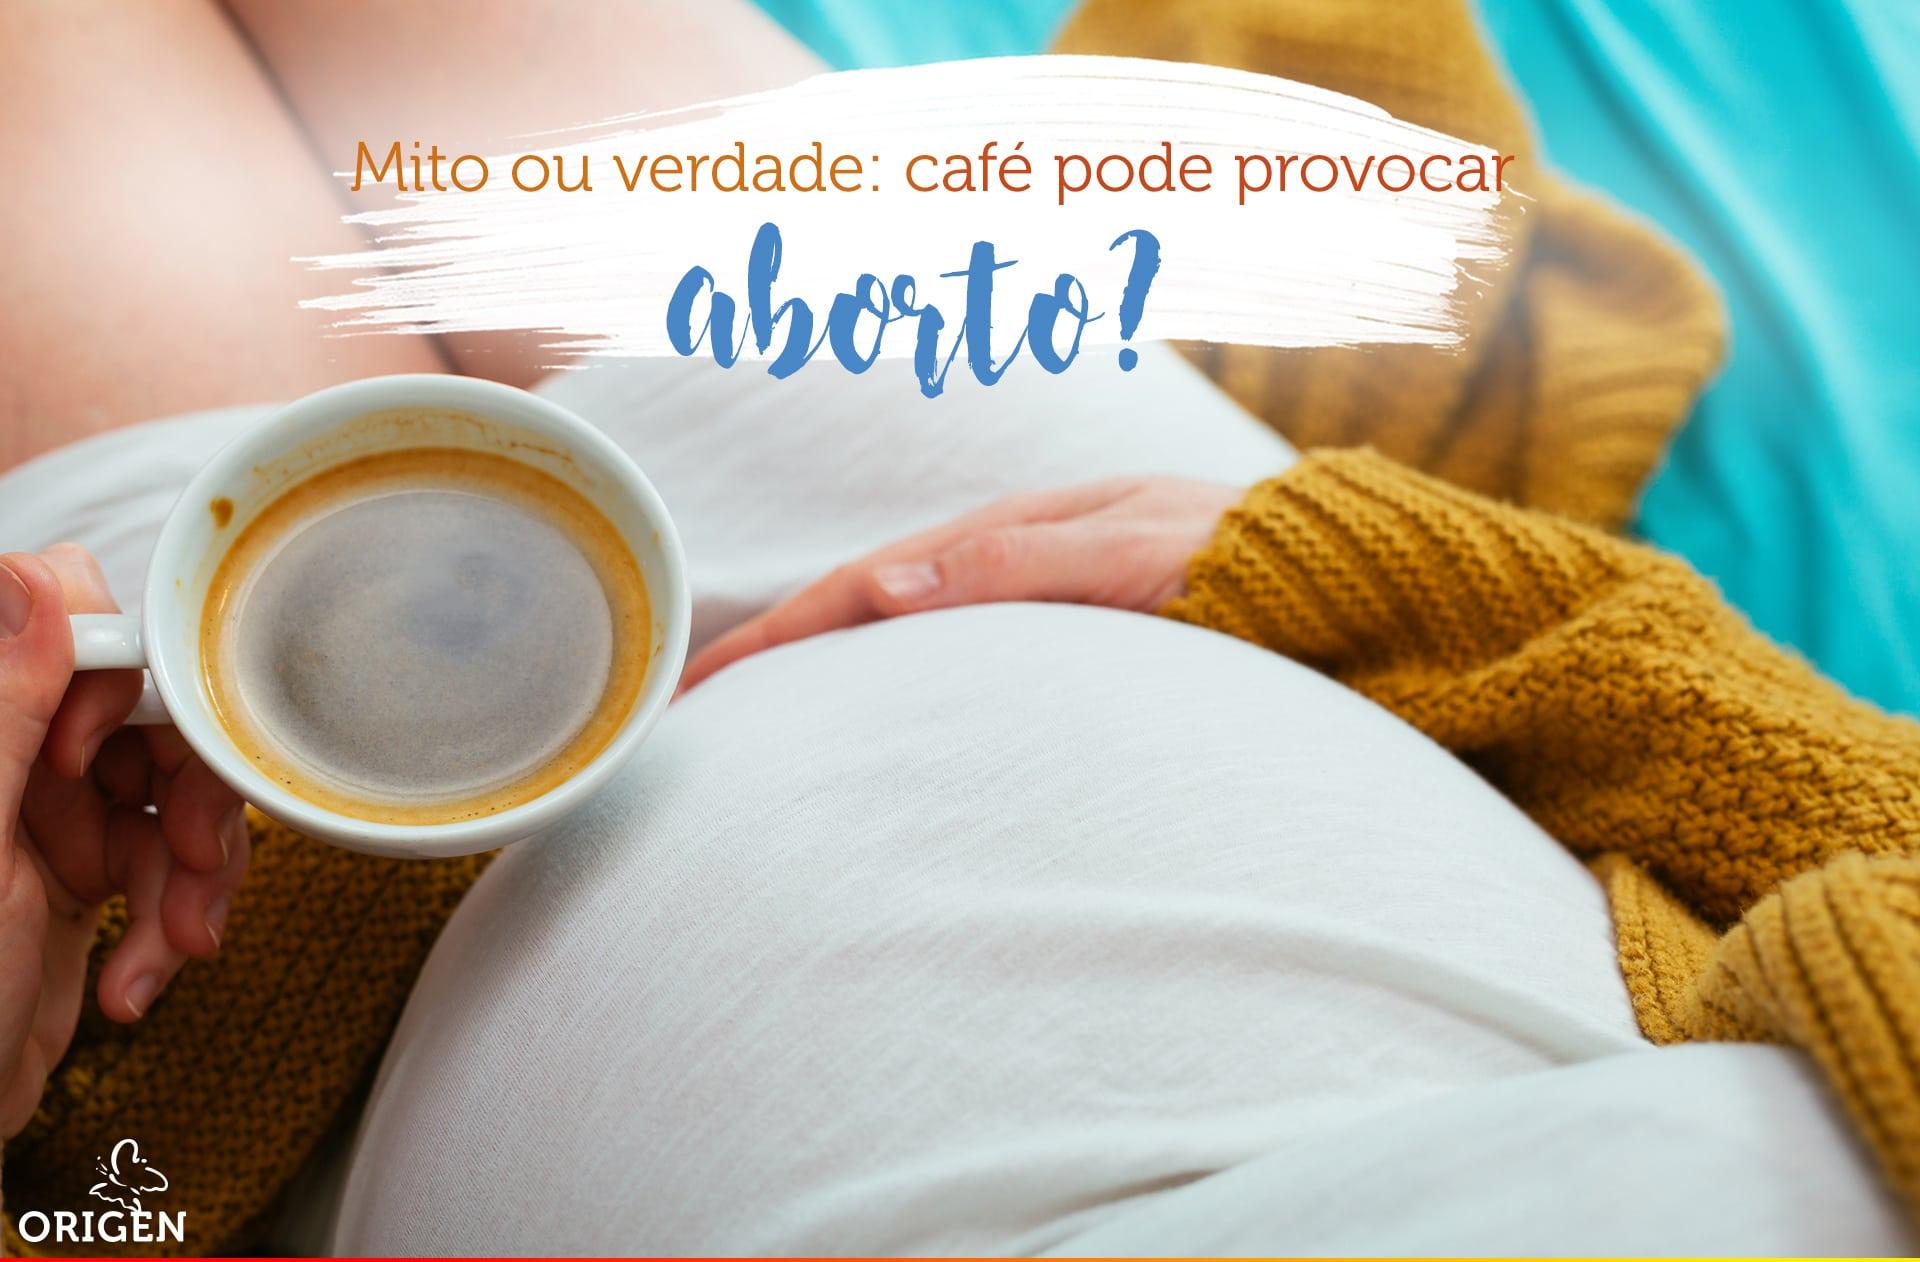 Mito ou verdade: café pode provocar aborto?